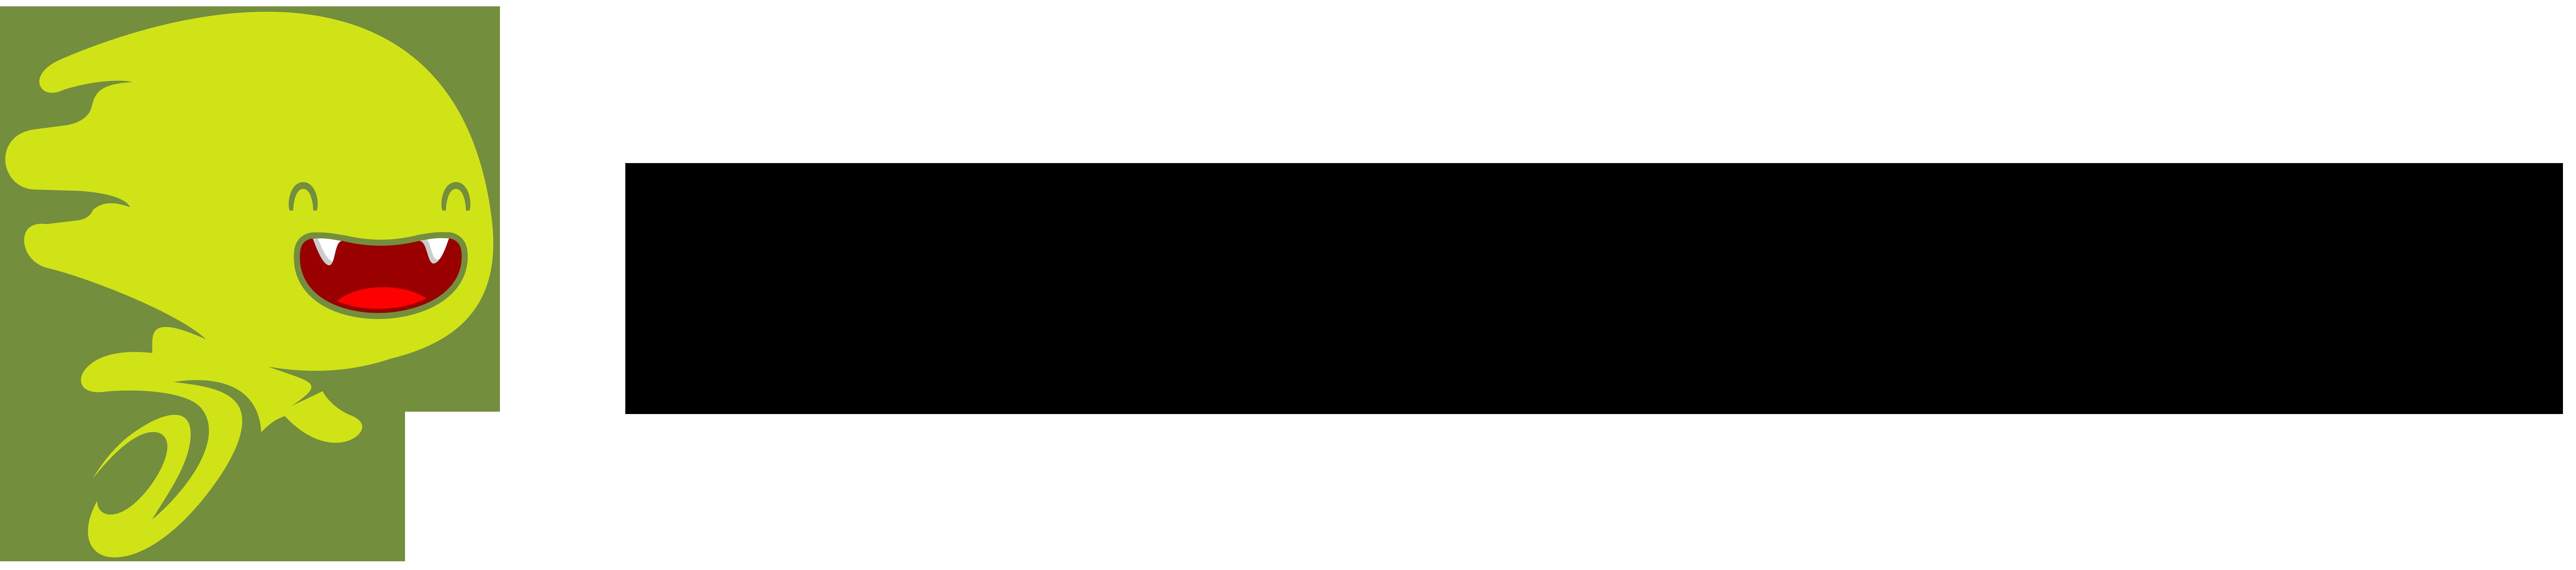 Ligar Gratis Qualquer-575205